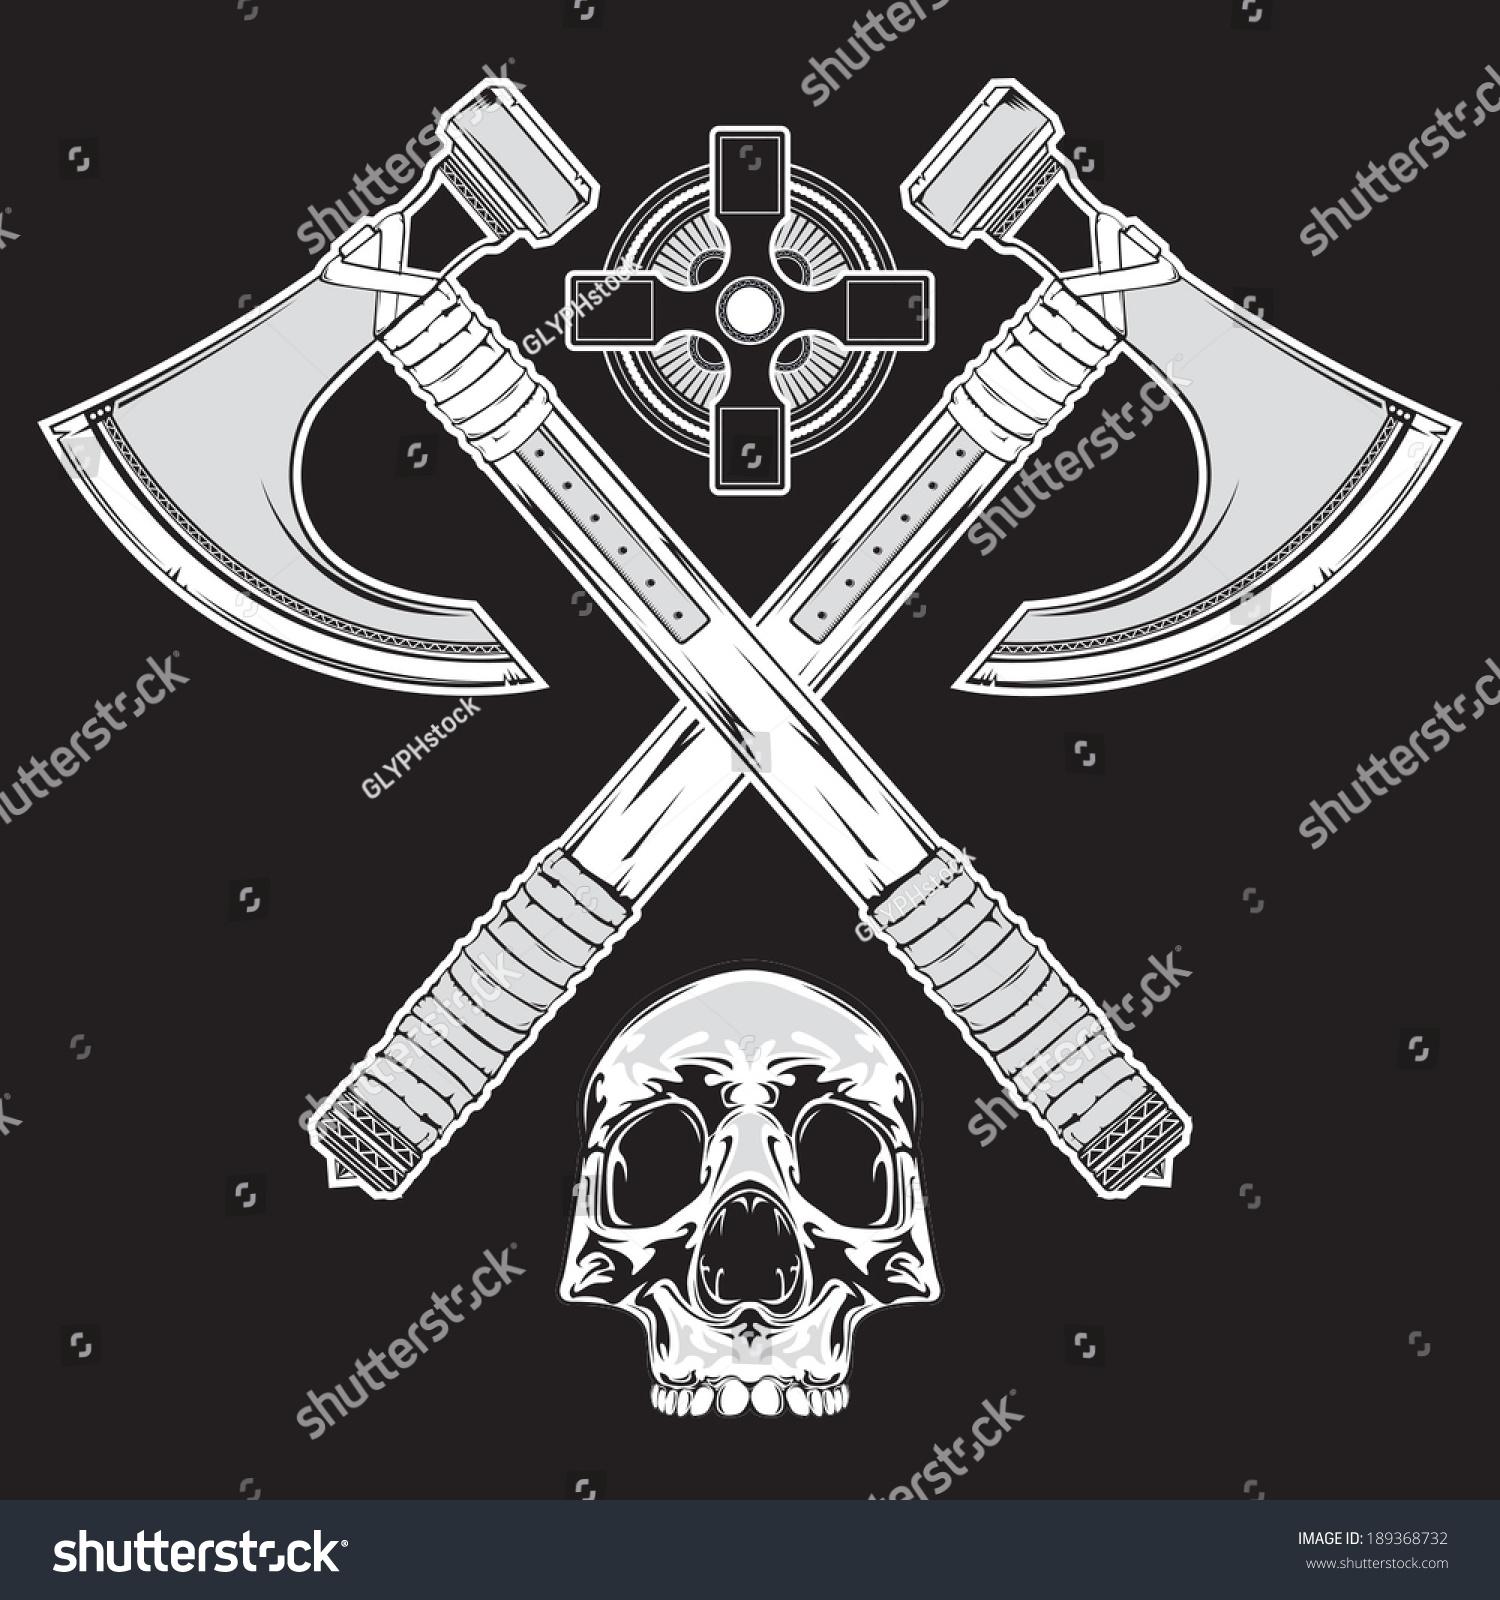 tattoo style illustration crossed battle axes stock vector 189368732 shutterstock. Black Bedroom Furniture Sets. Home Design Ideas